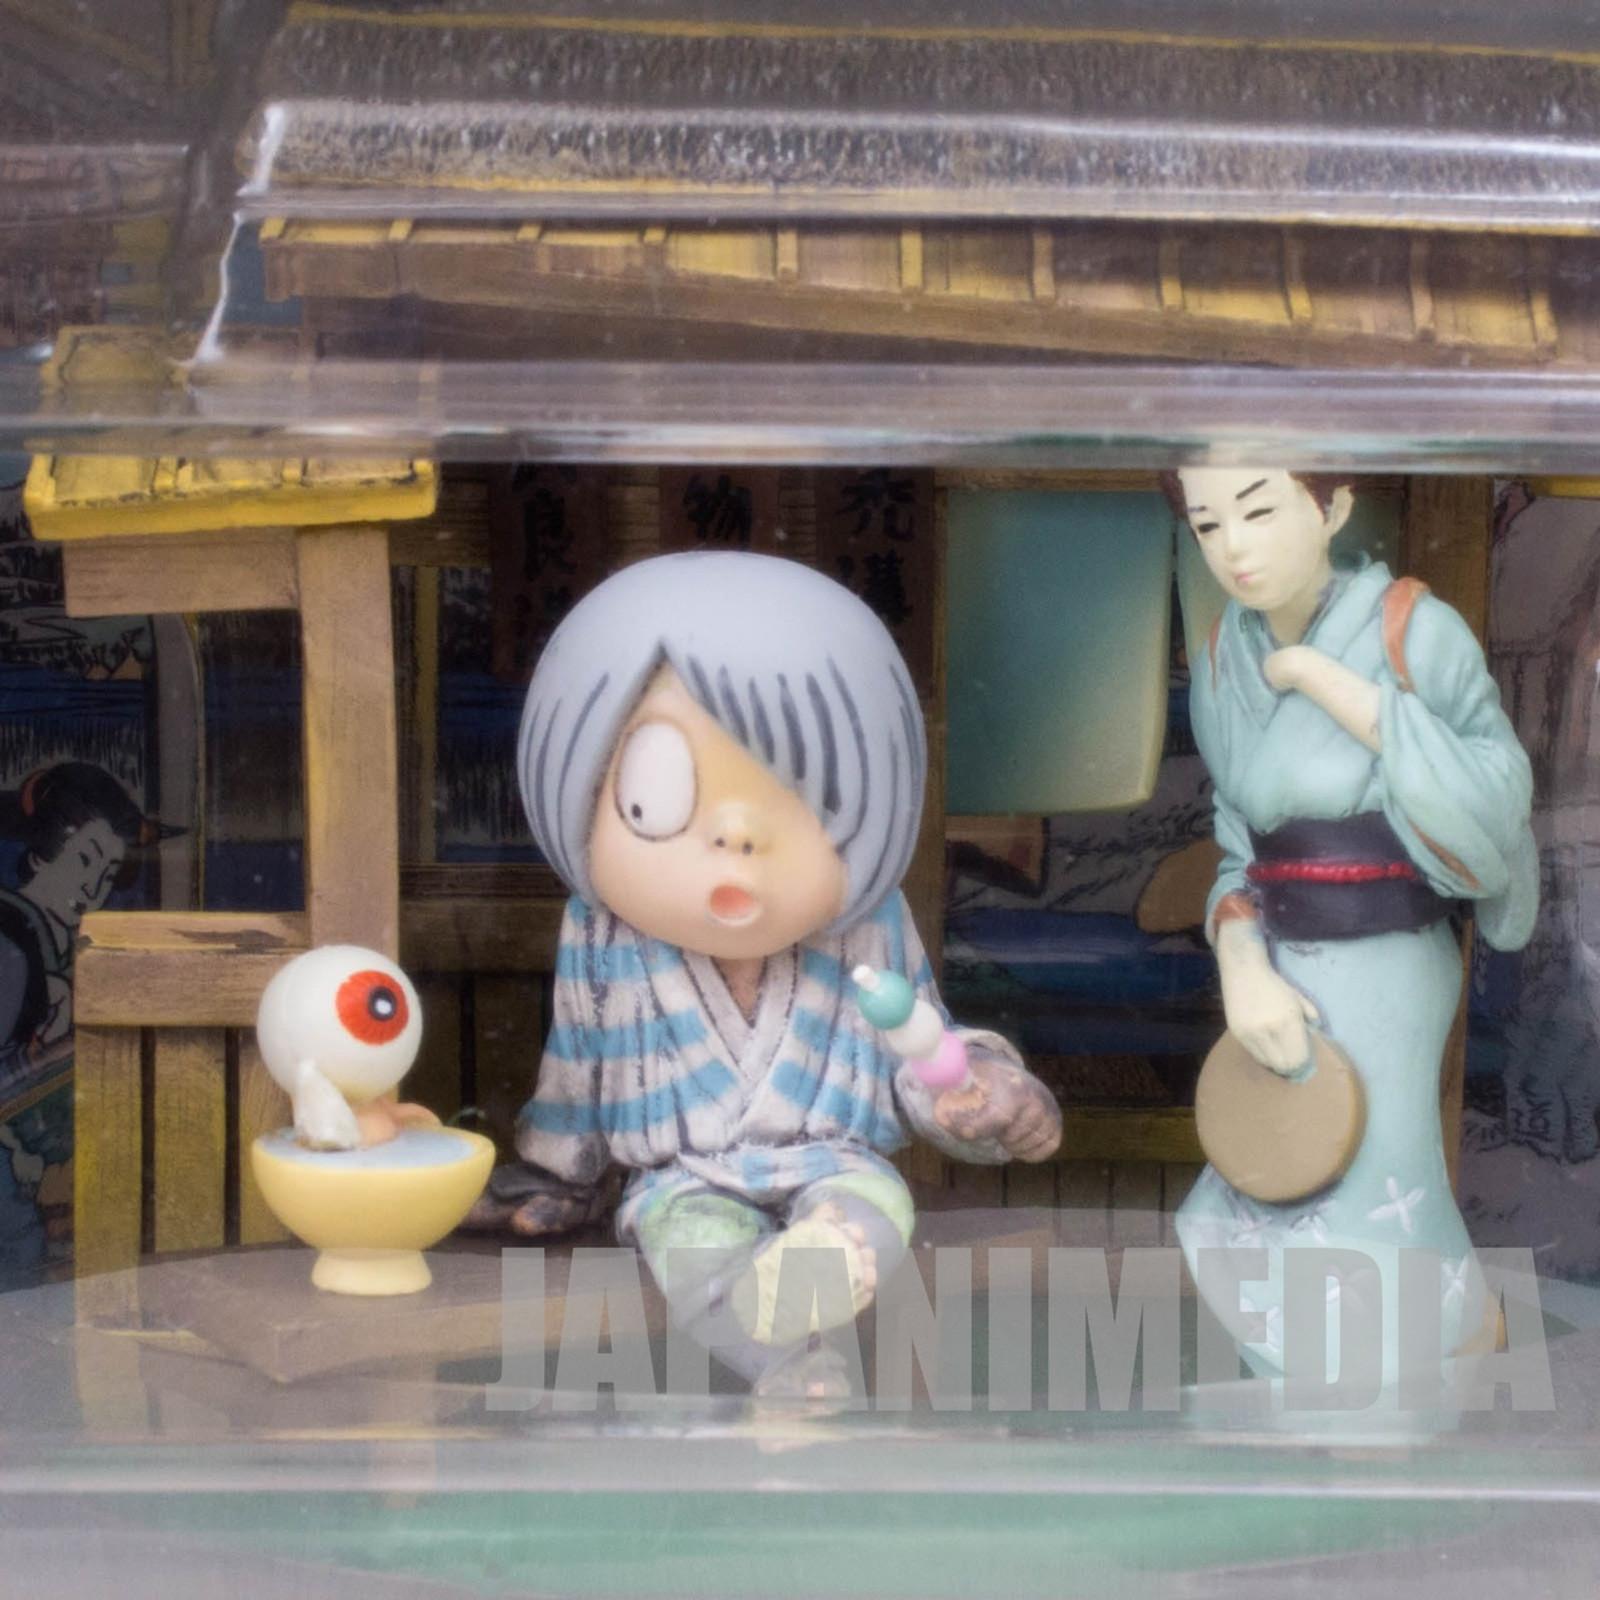 Gegege no Kitaro Diorama Vignette Figure Totsuka Ver. Youkai JAPAN ANIME